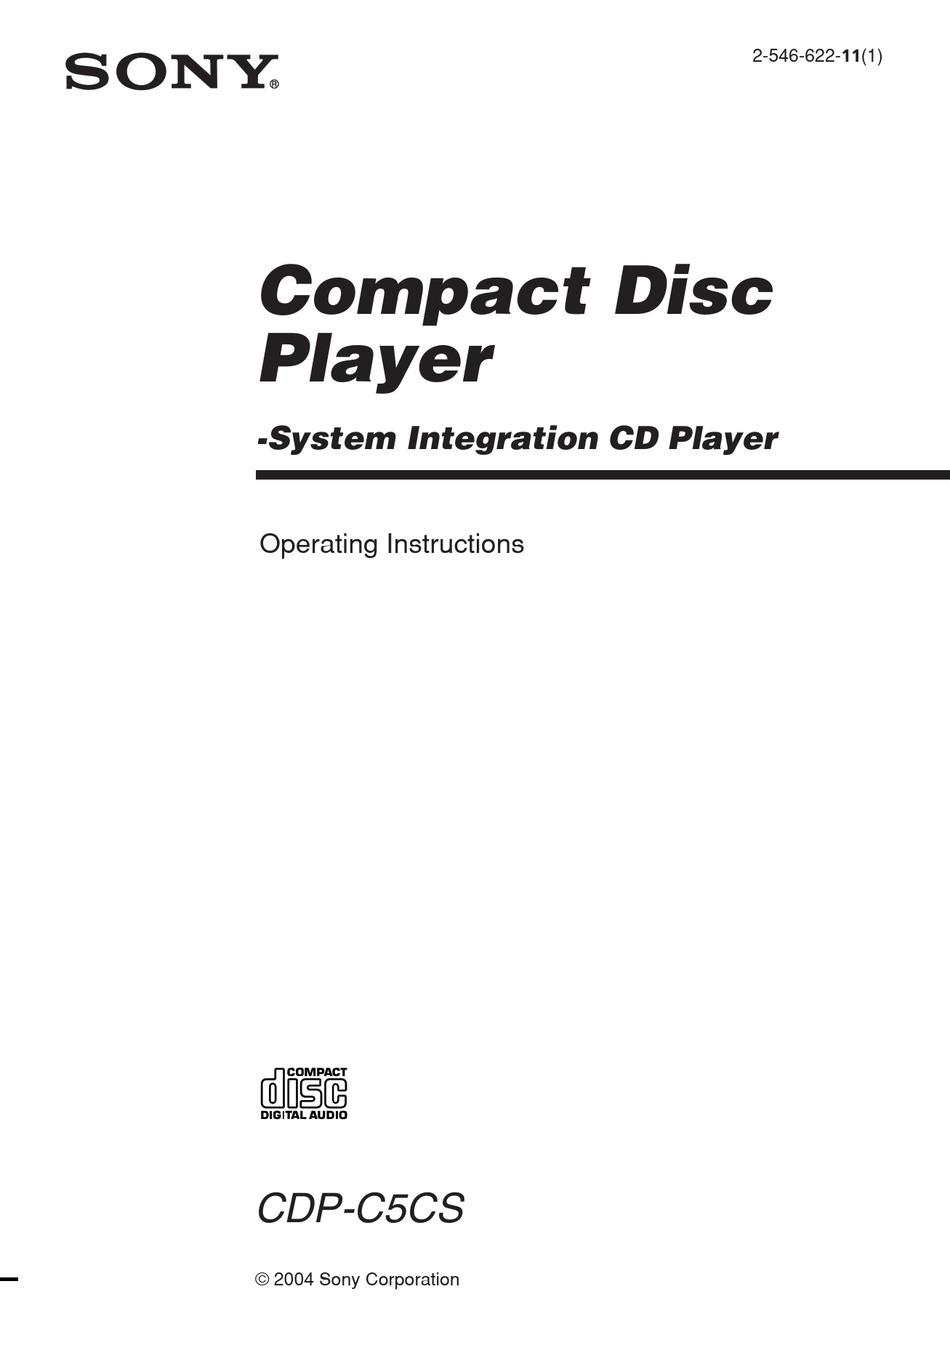 SONY CDP-C5CS OPERATING INSTRUCTIONS (CDPC5CS) OPERATING